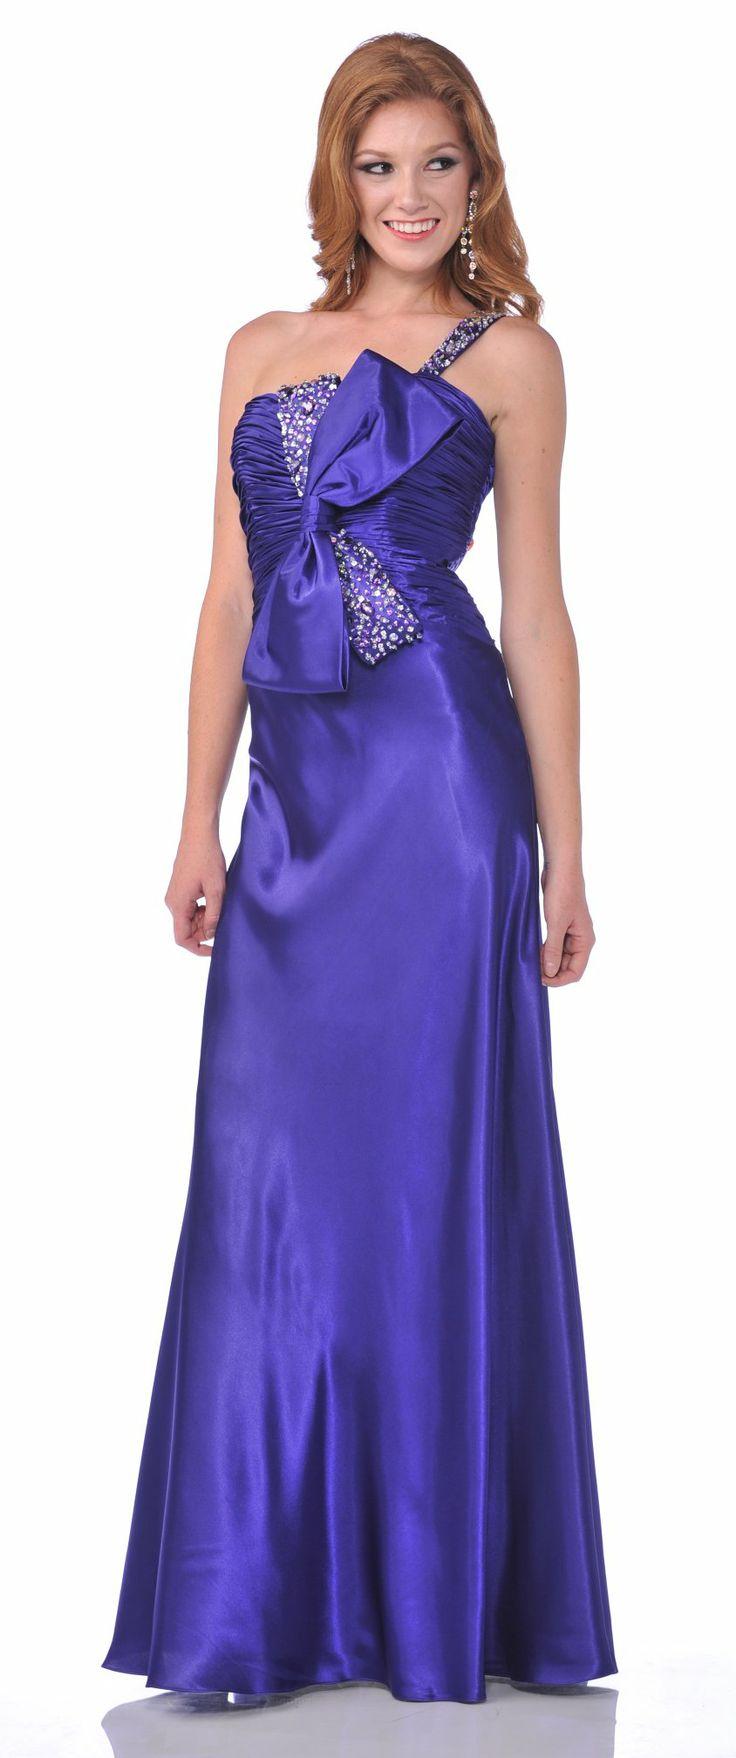 Mejores 312 imágenes de Semi Formal Dresses en Pinterest | Vestidos ...